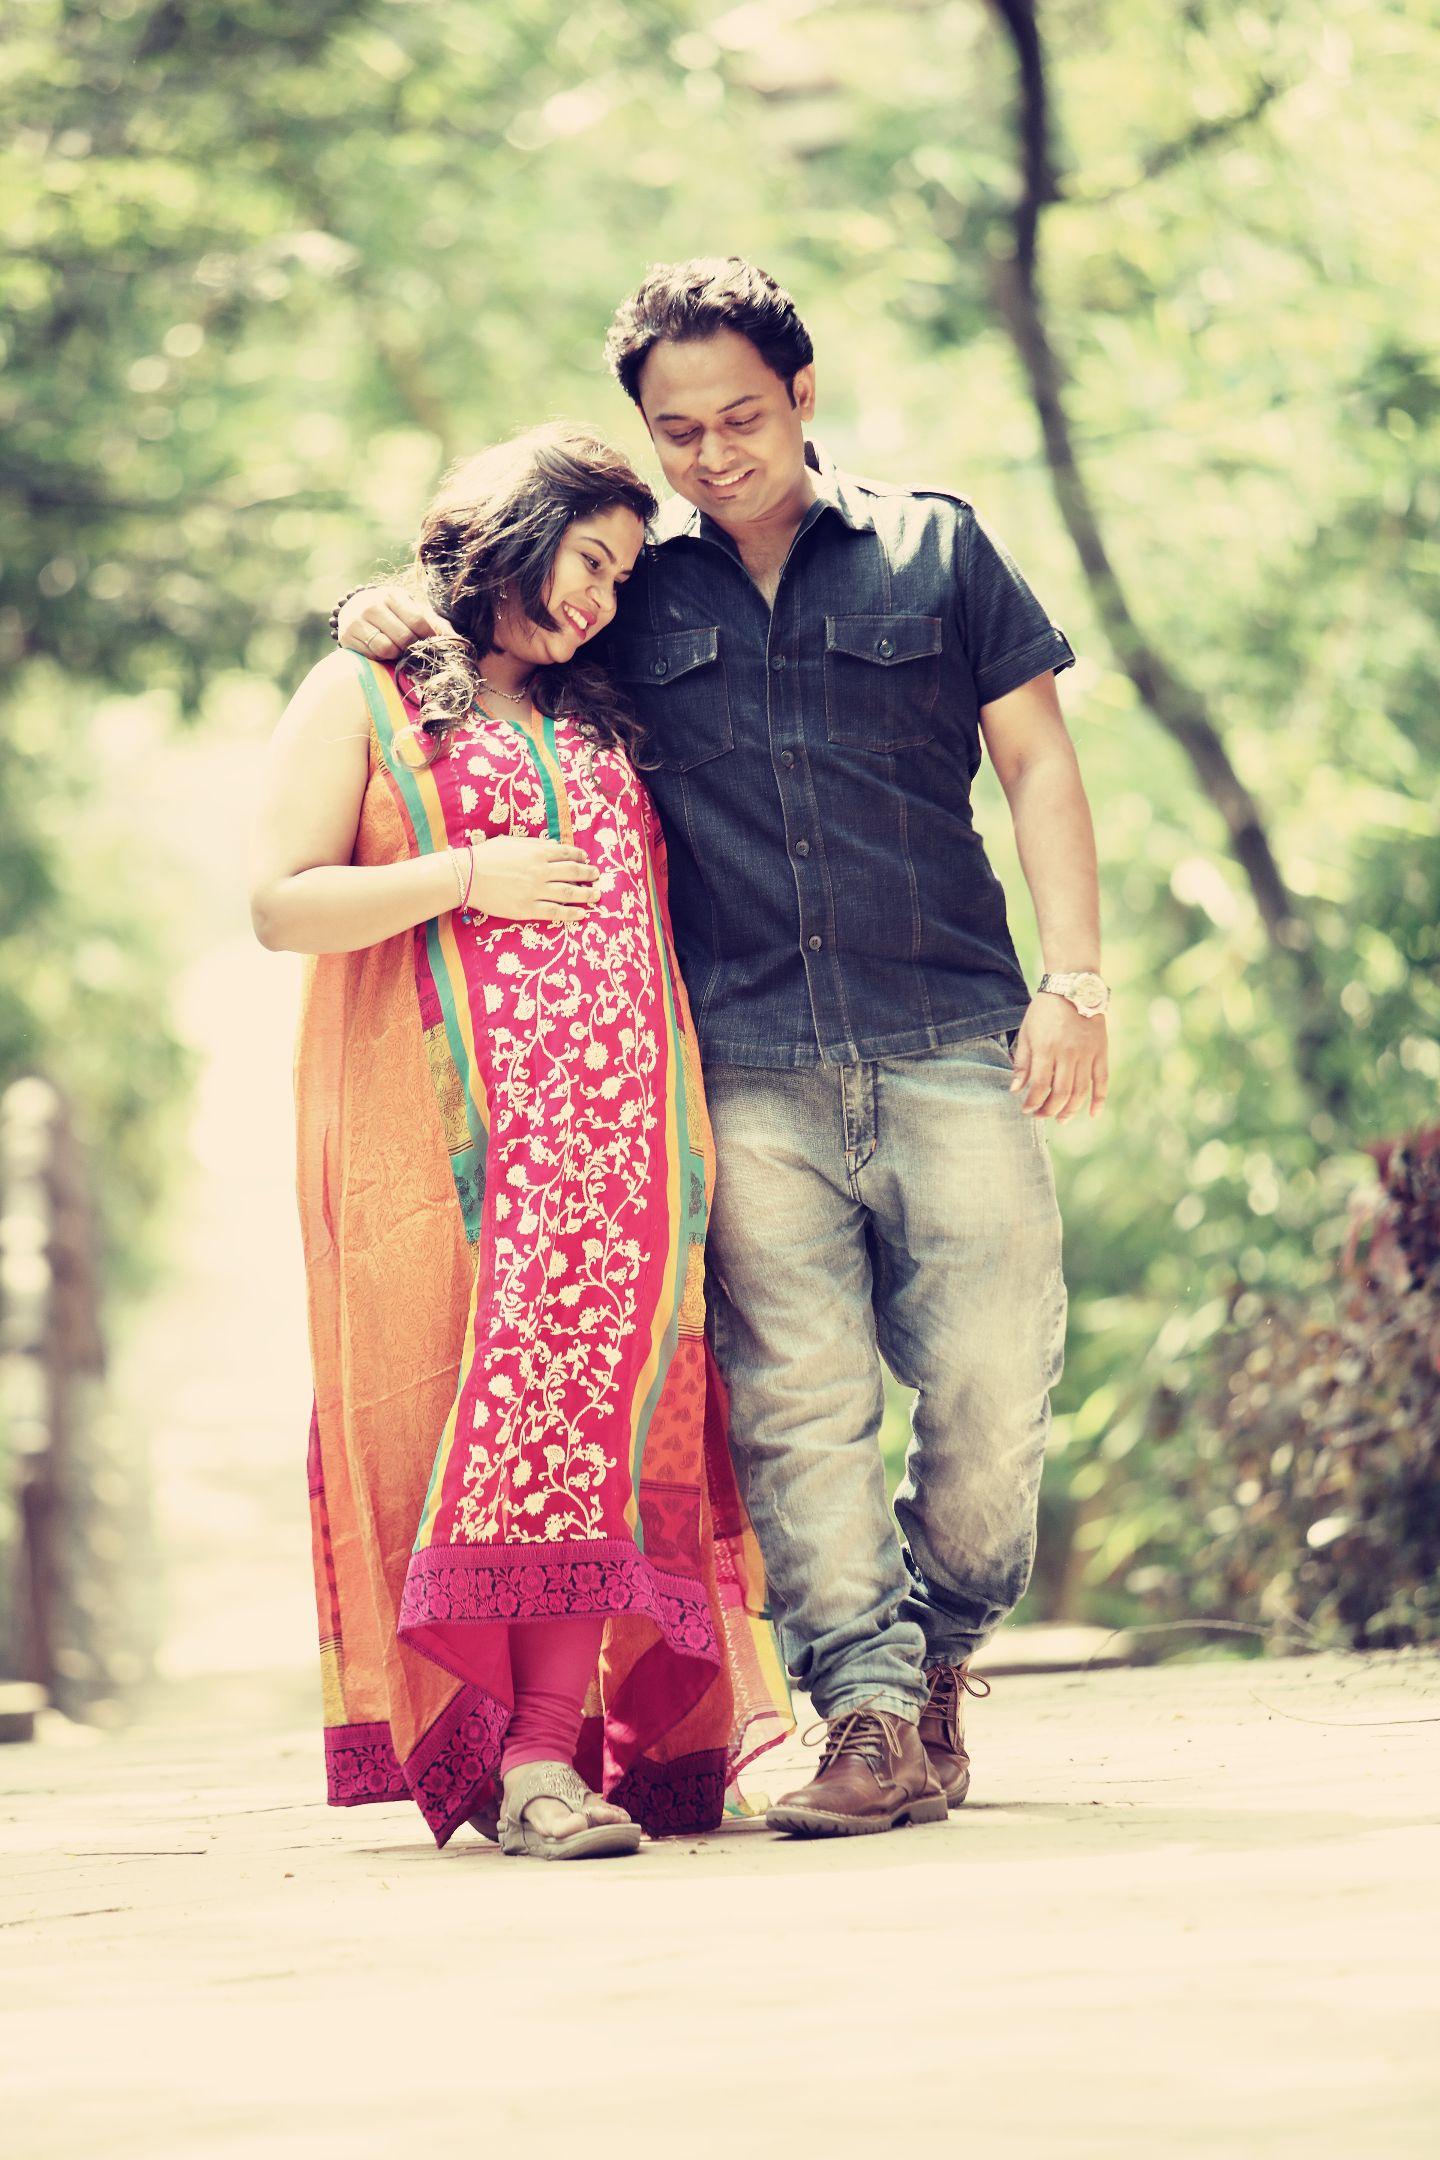 Indian Maternity Shoot Maternity Photo Shoot Ideas Fotoshooting